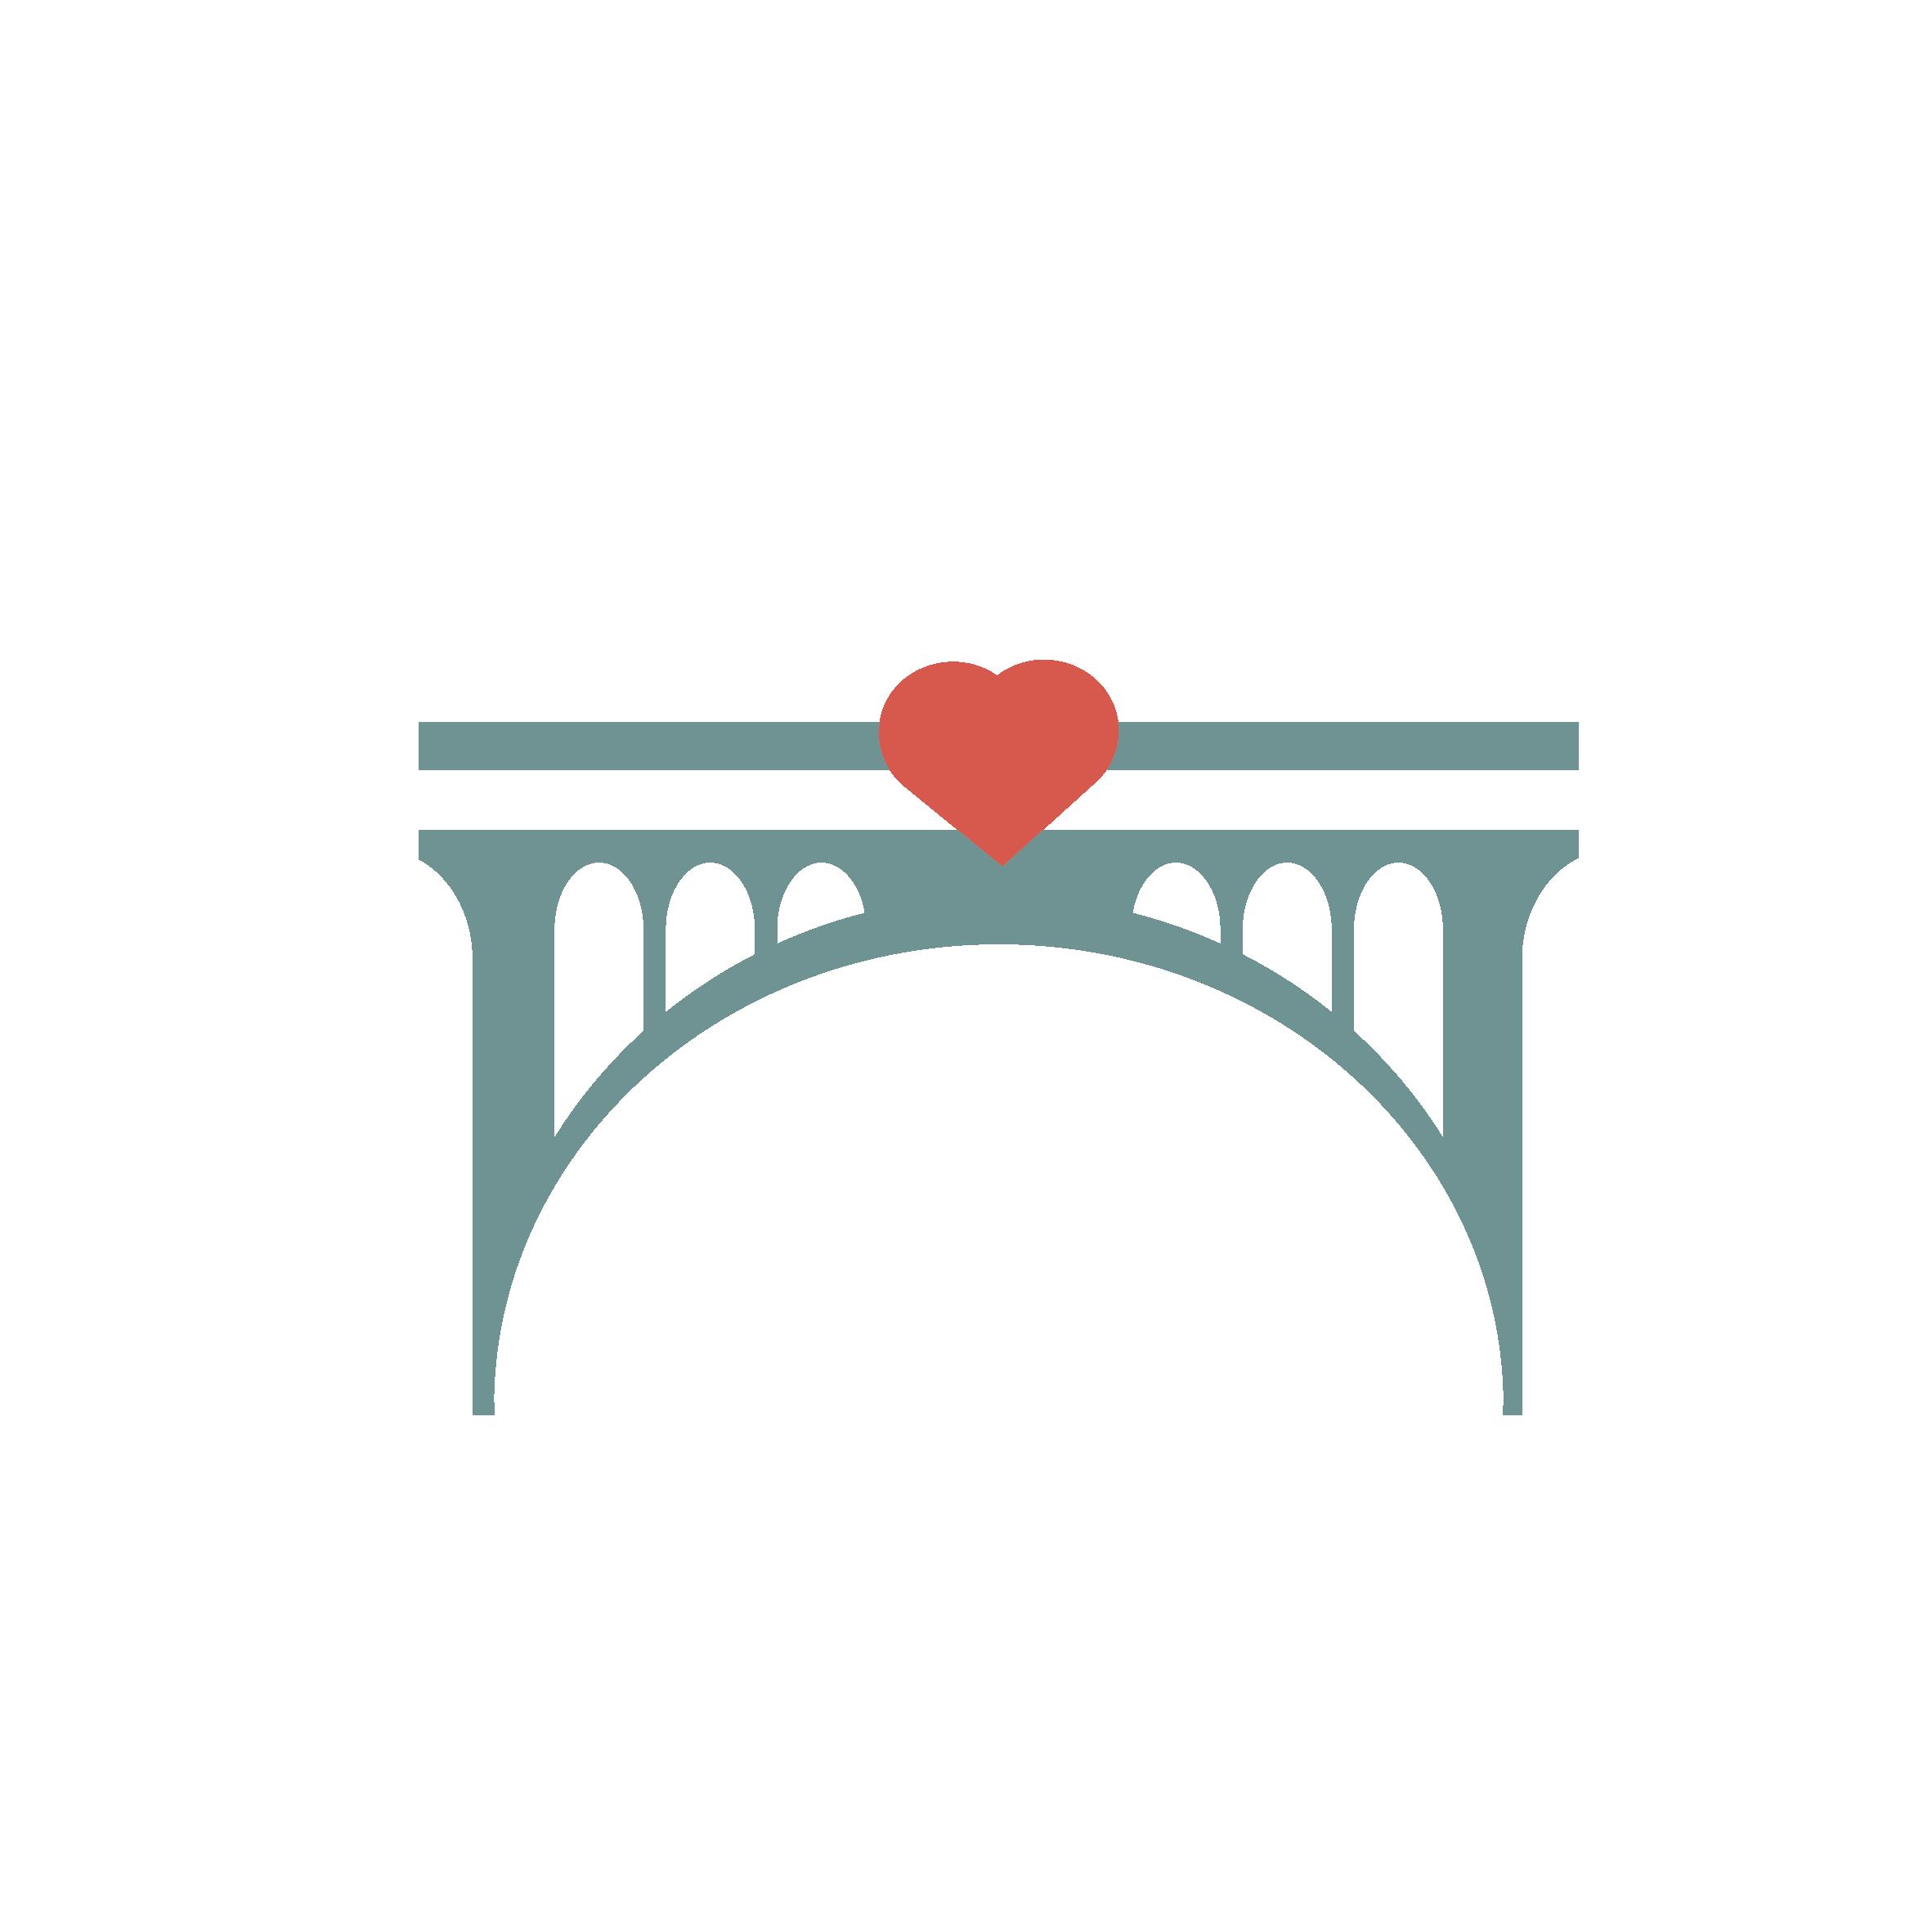 the Bridge of Kisses